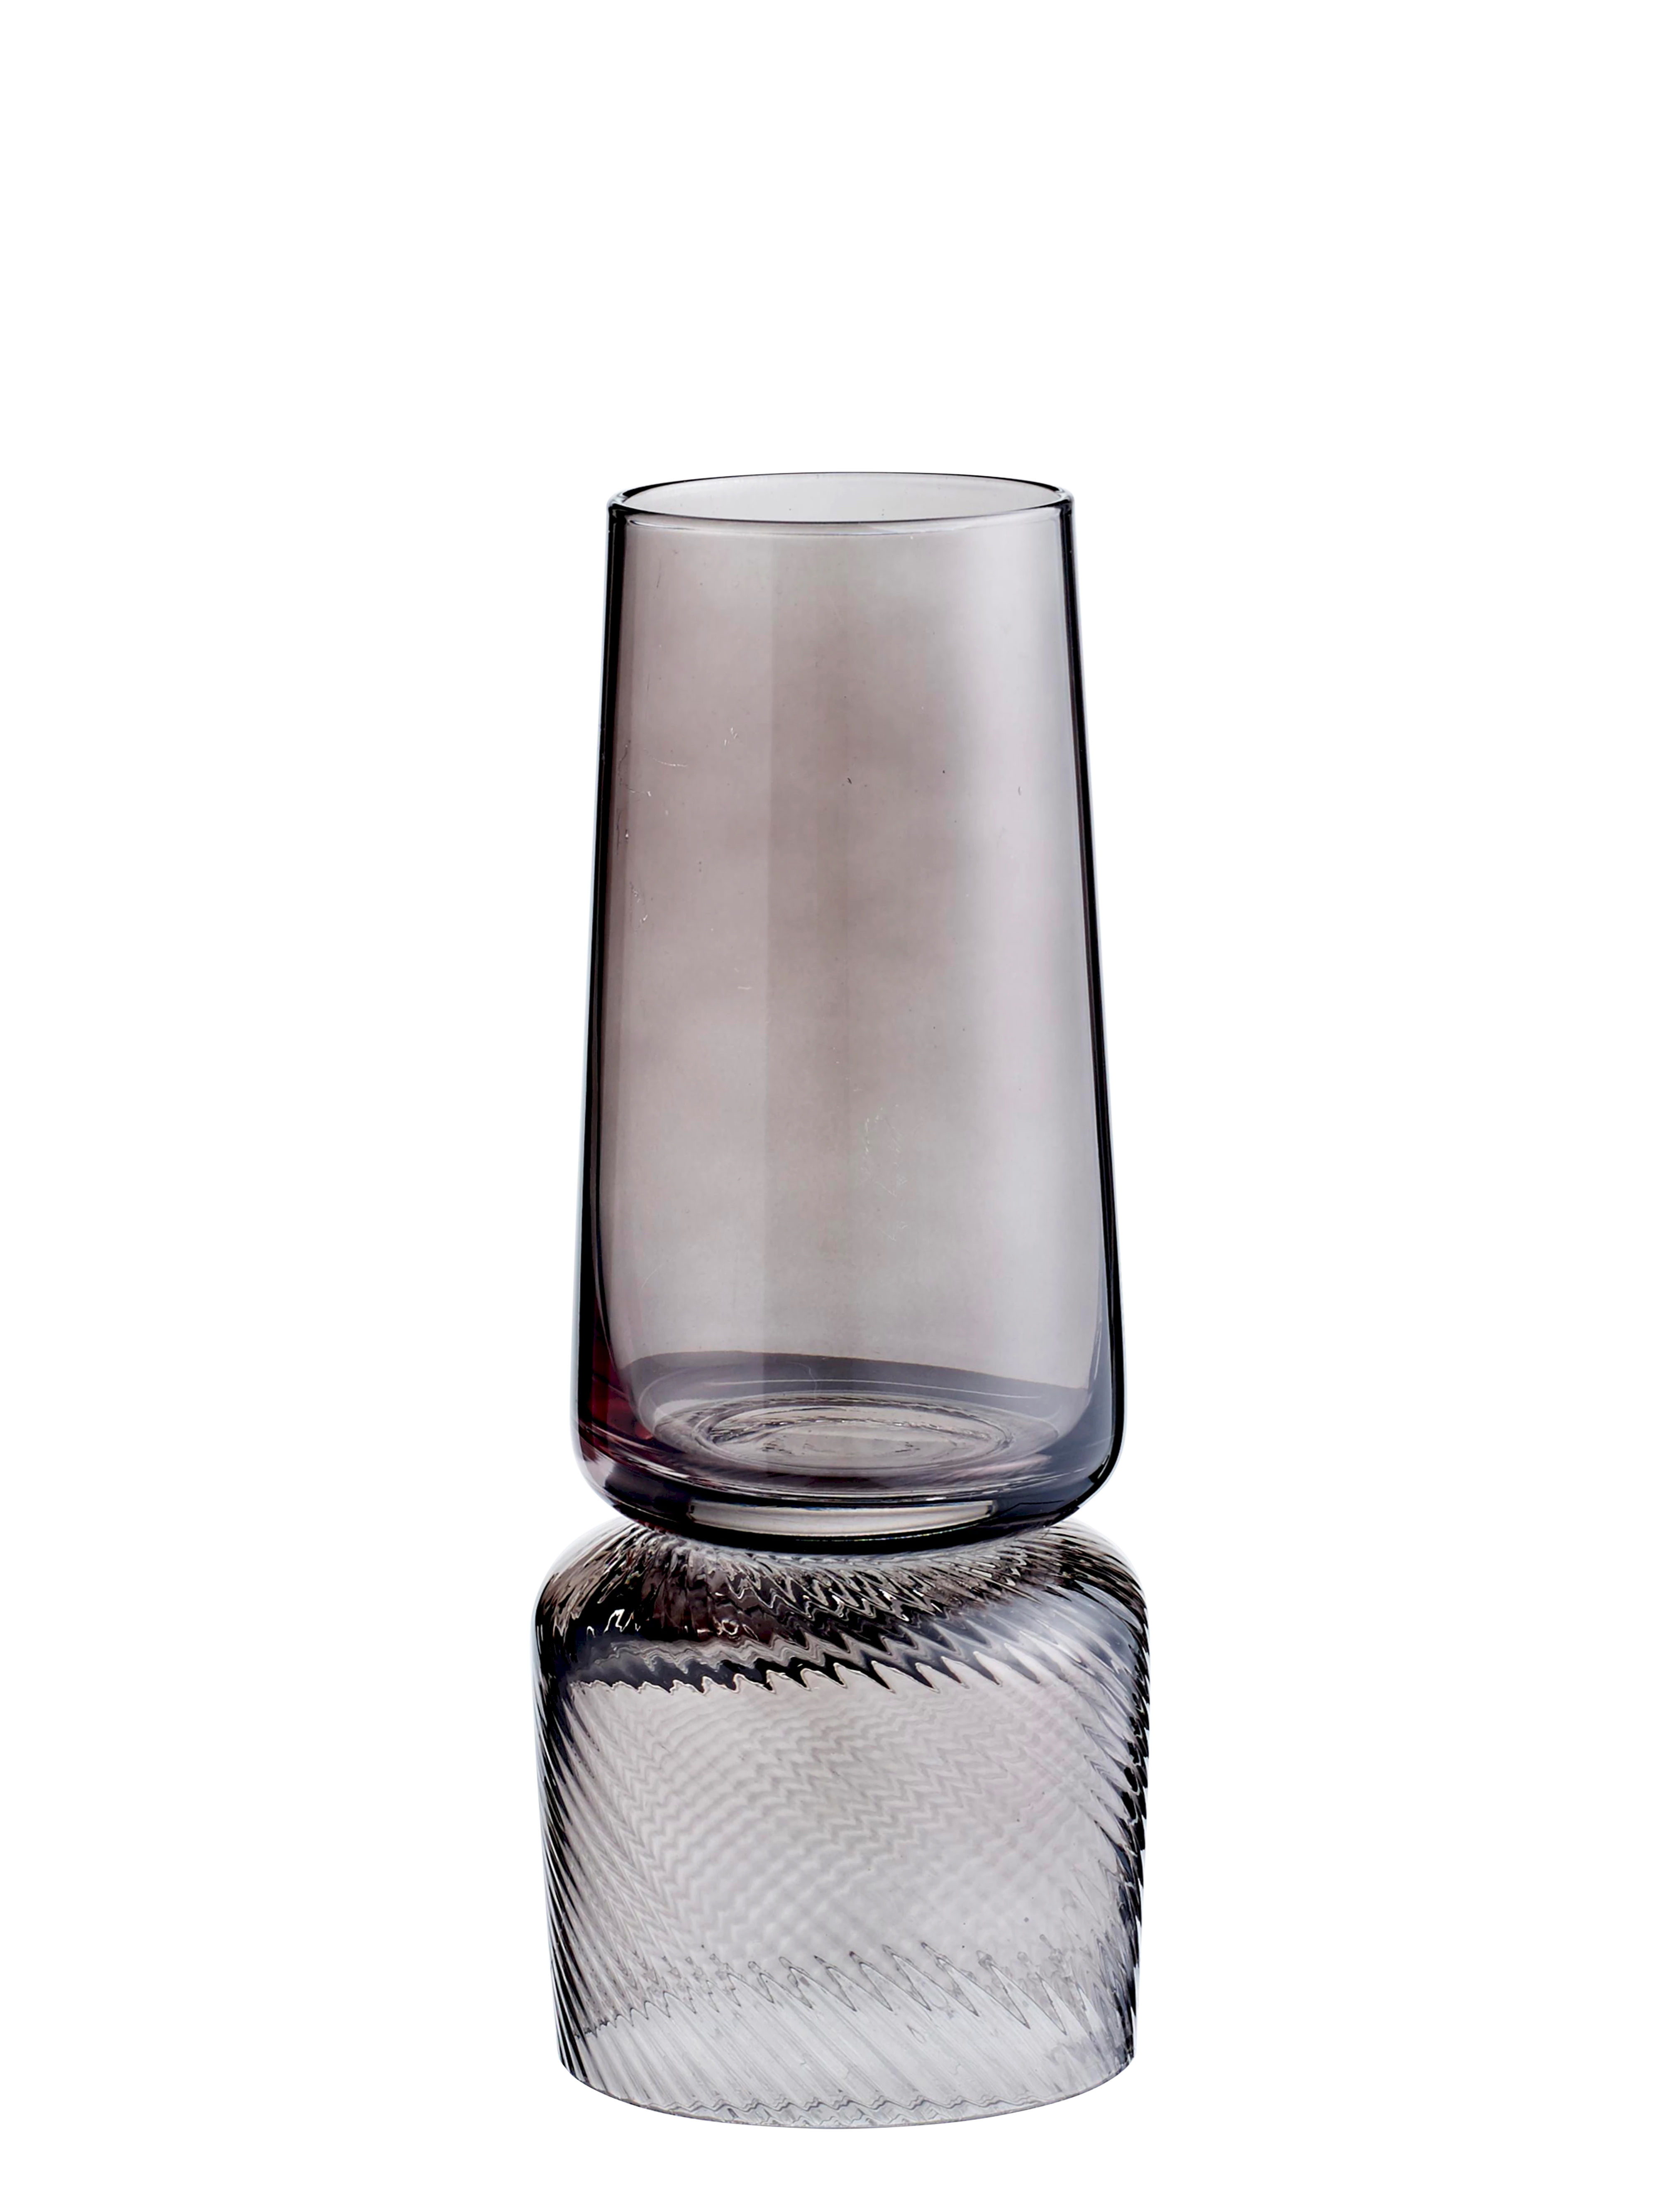 Decoration - Vases - Doppio Vase - / Candle holder - Reversible by Bolia - Smoked grey - Tinted glass